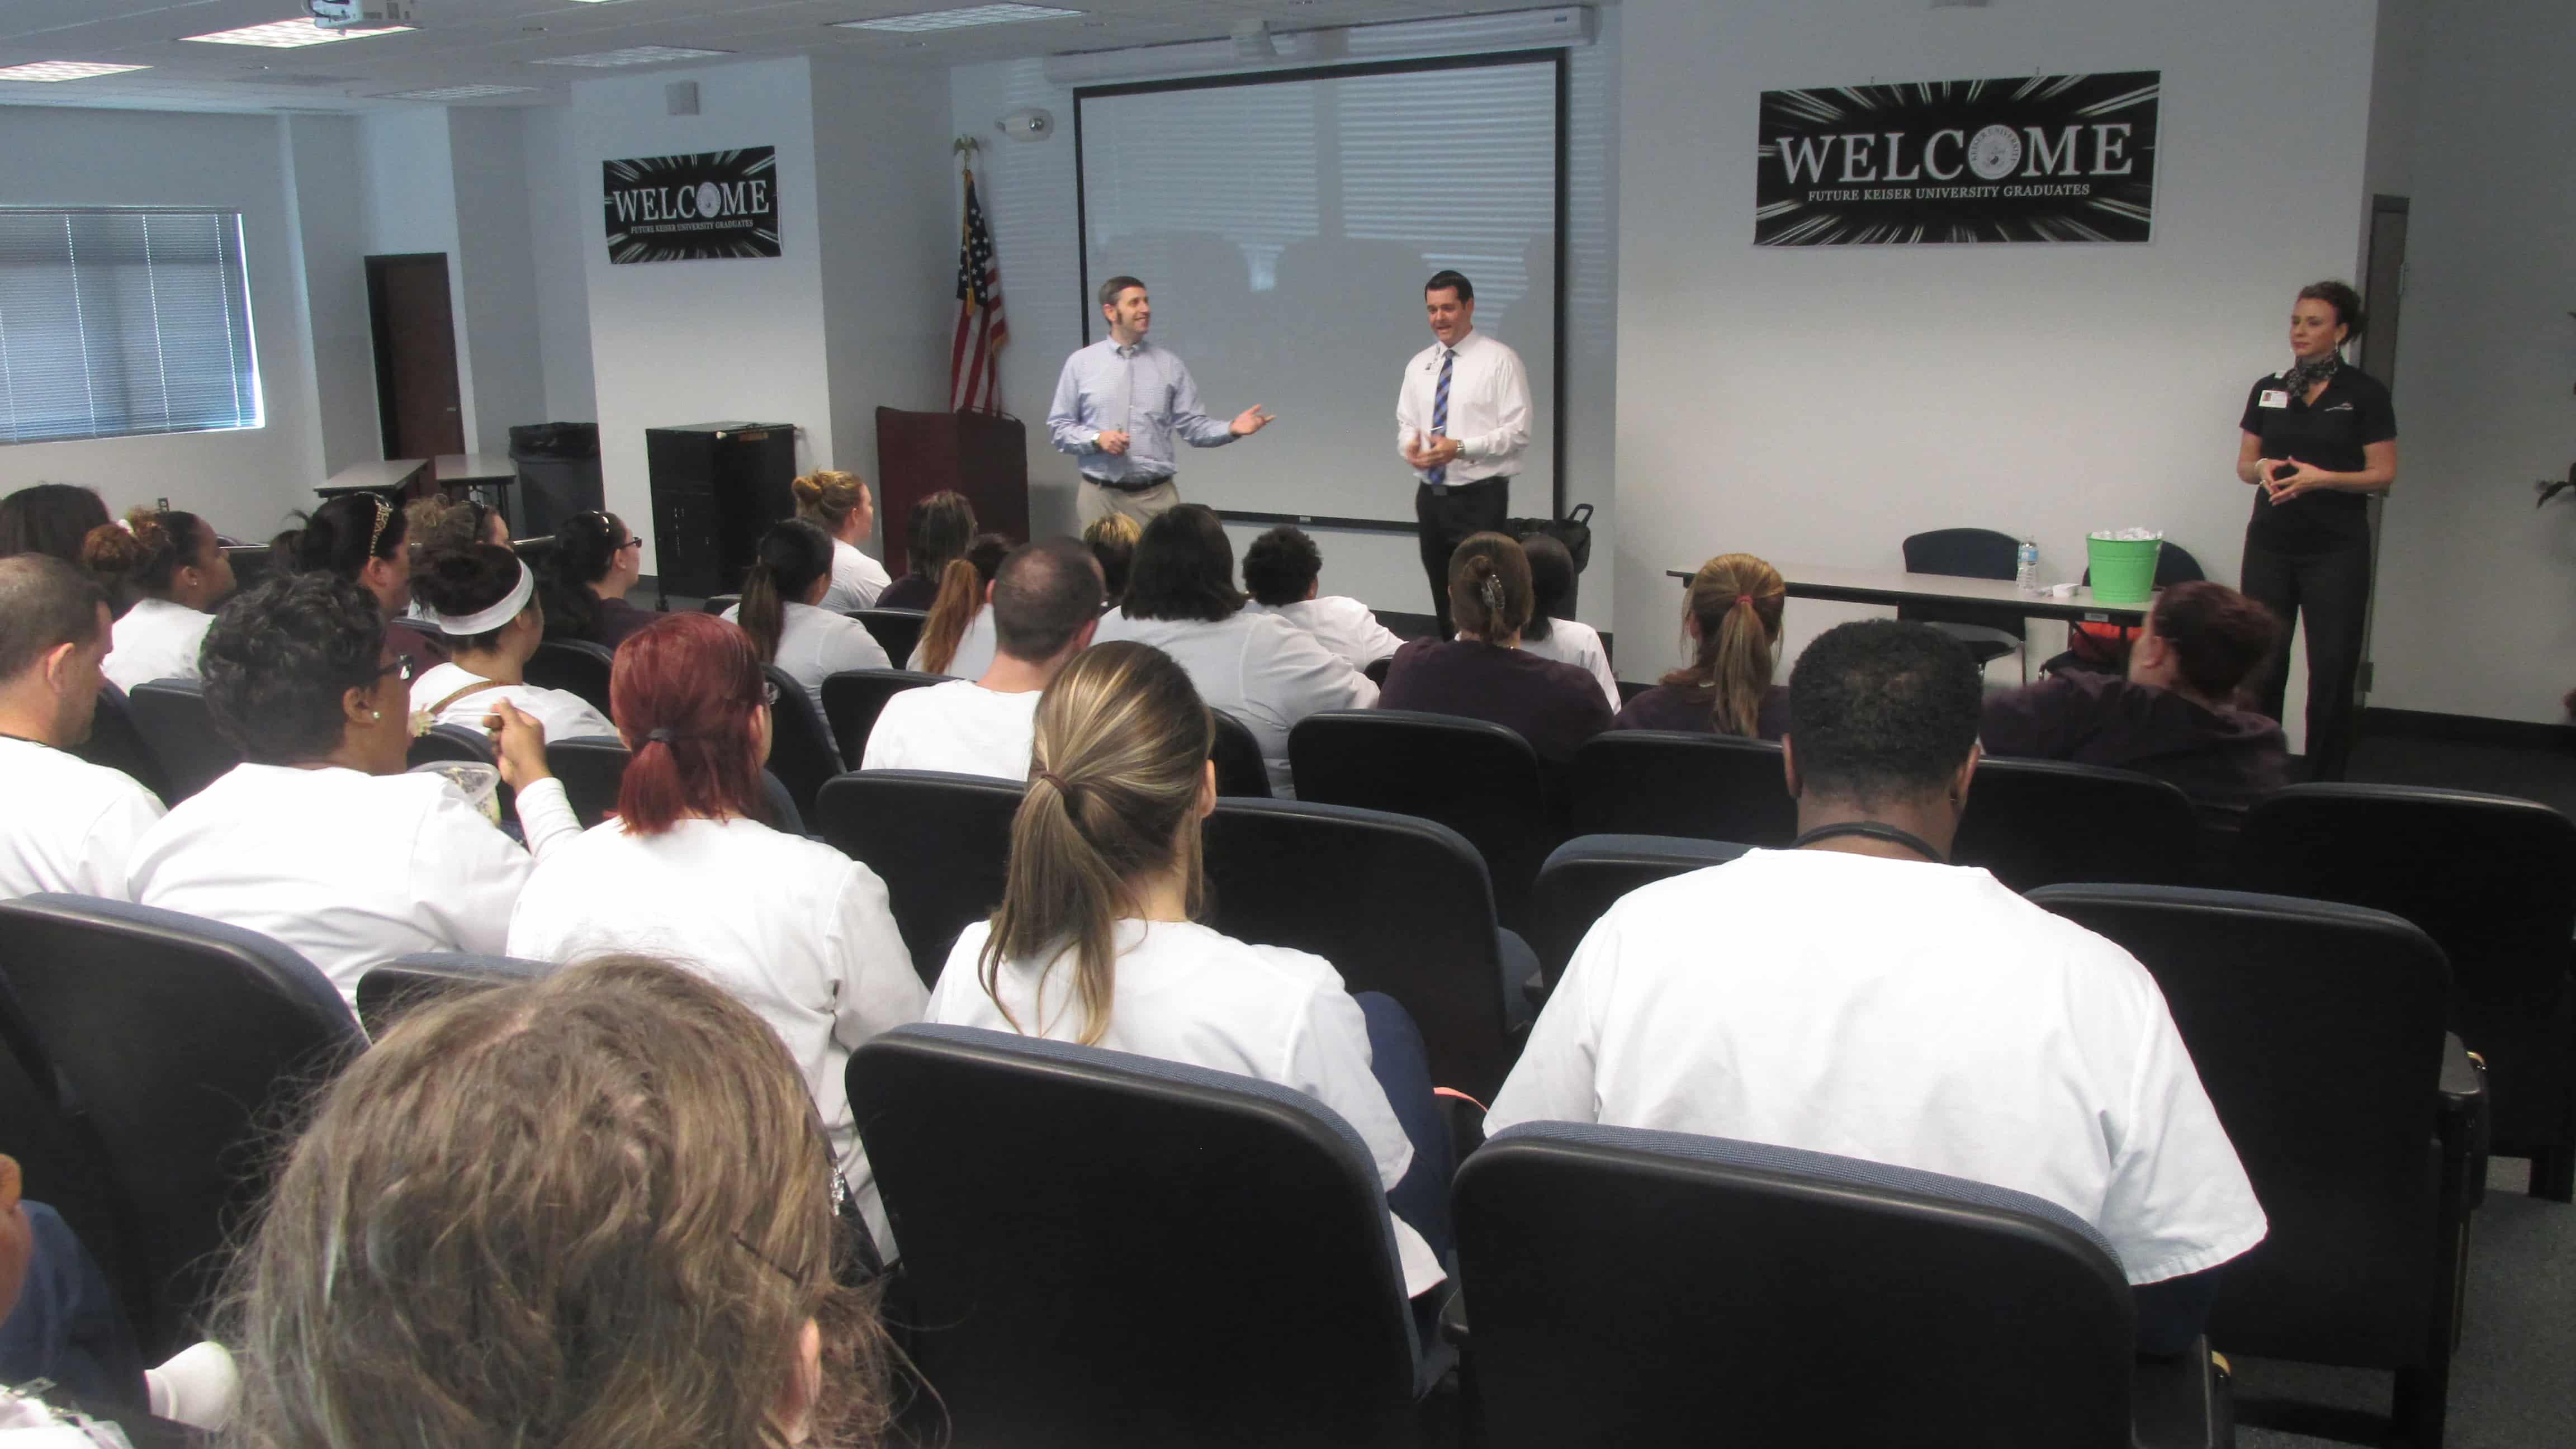 Lakeland Regional Health Visits the Lakeland KU Campus